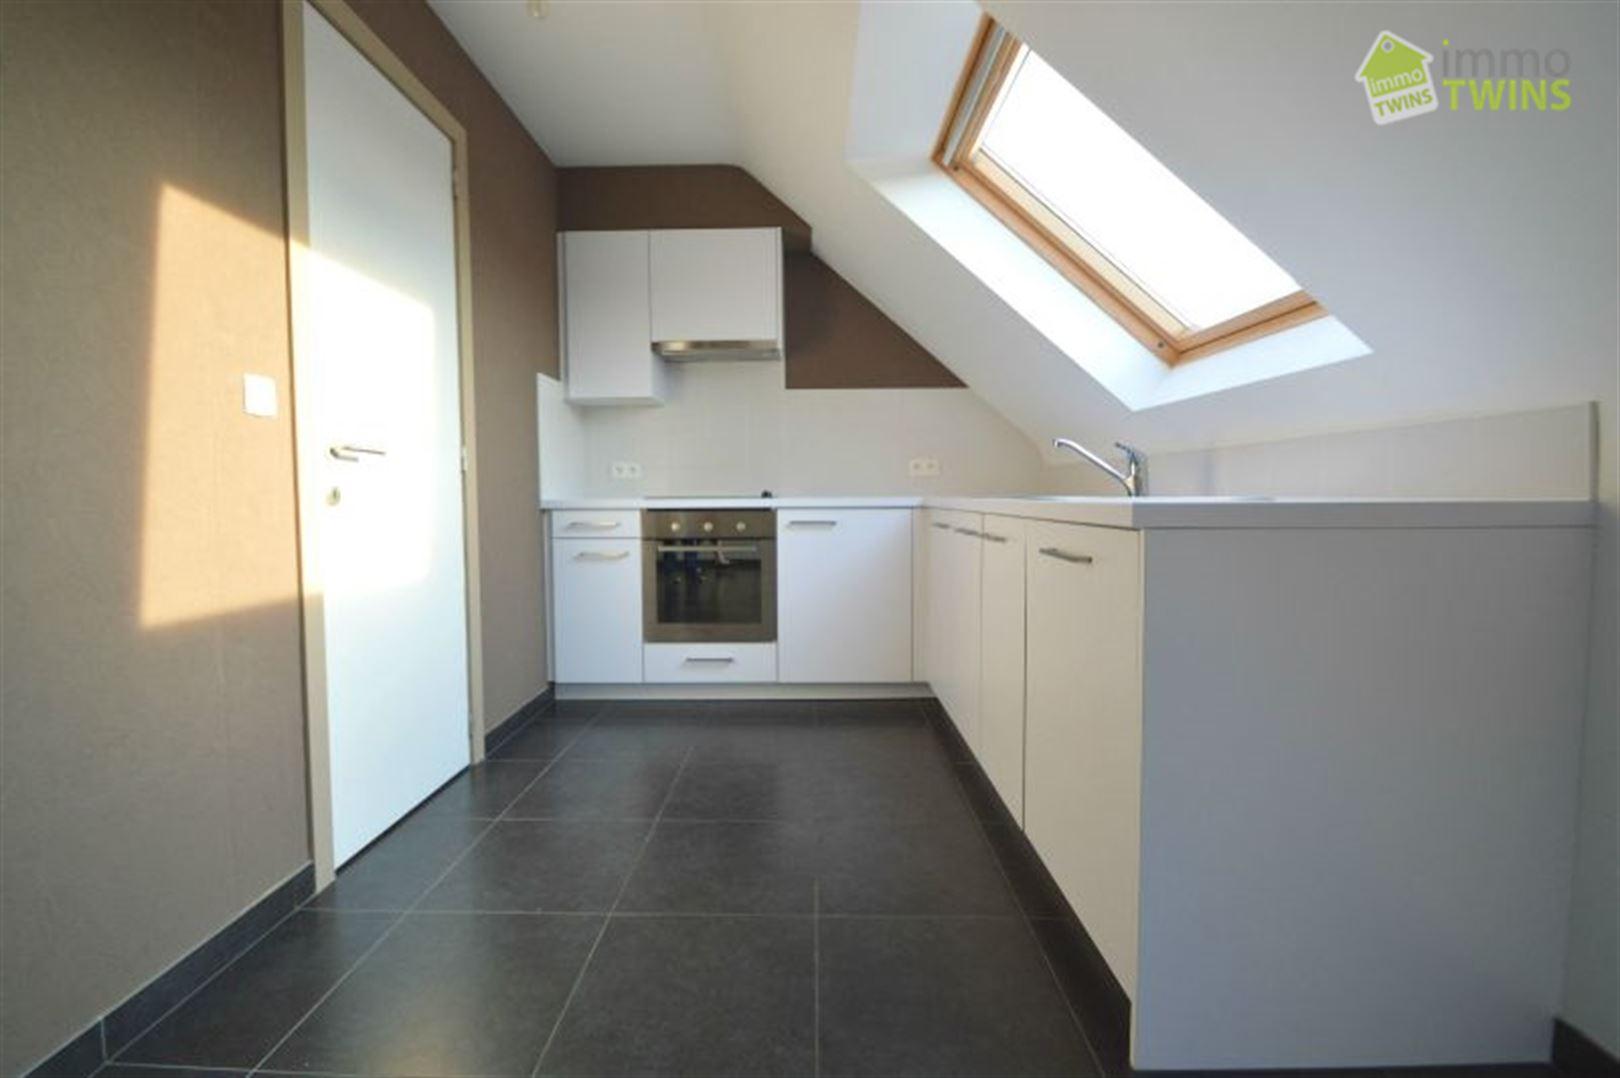 Foto 4 : Appartement te 9200 Baasrode (België) - Prijs € 660